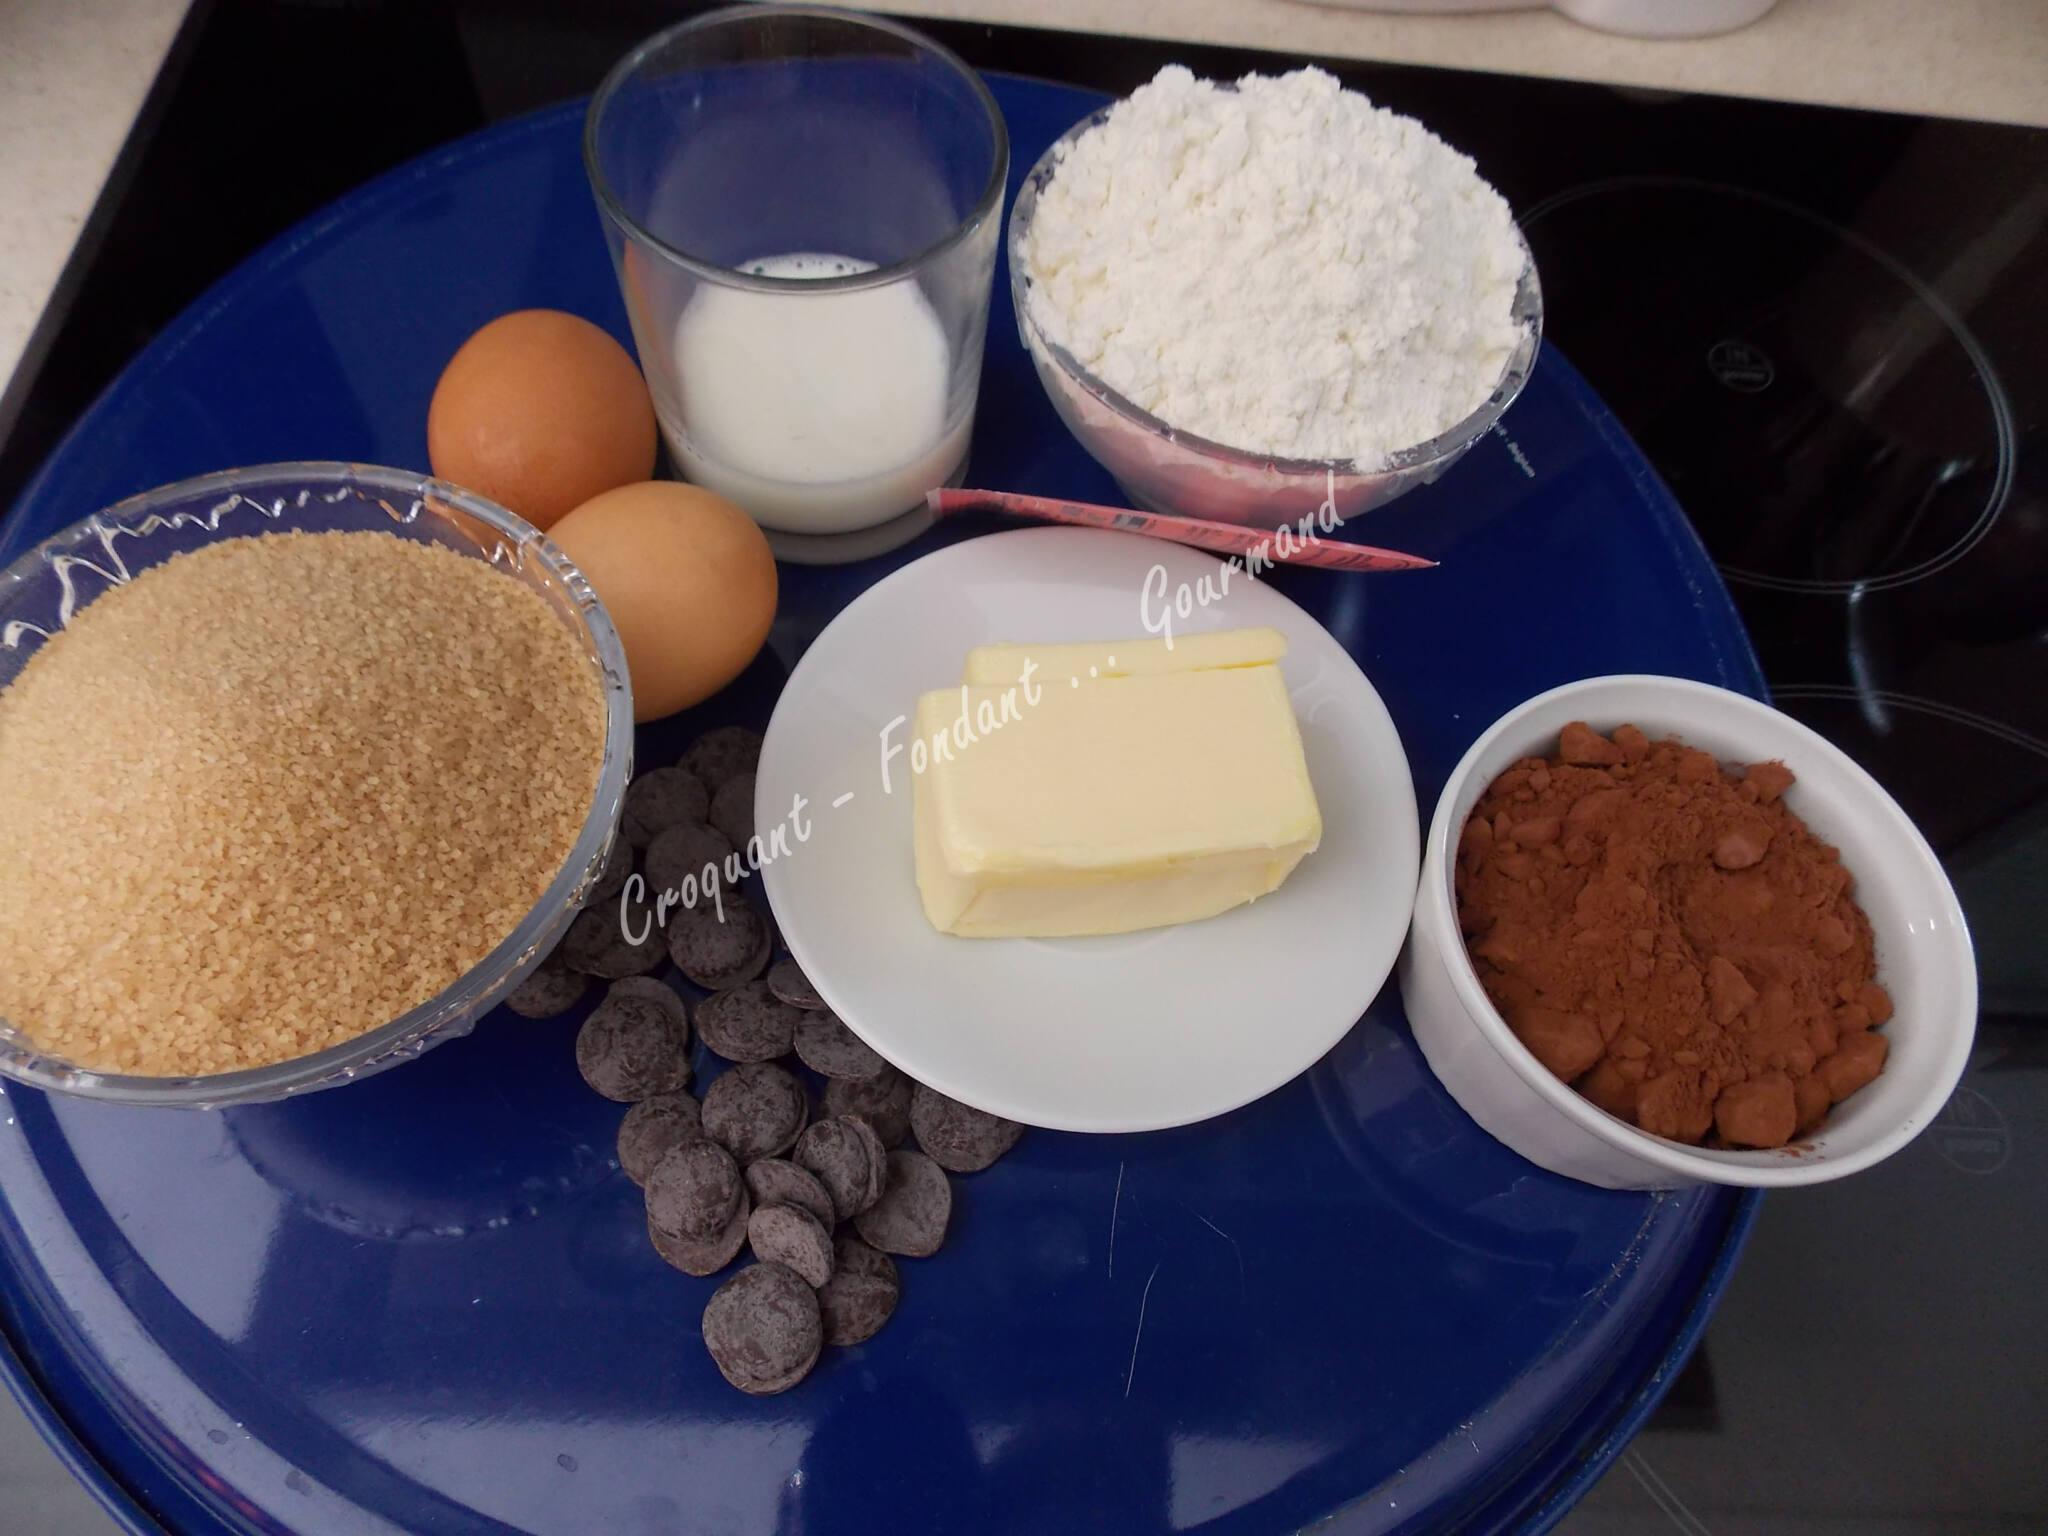 Comment mesurer des grammes sans balance - Peser farine sans balance ...